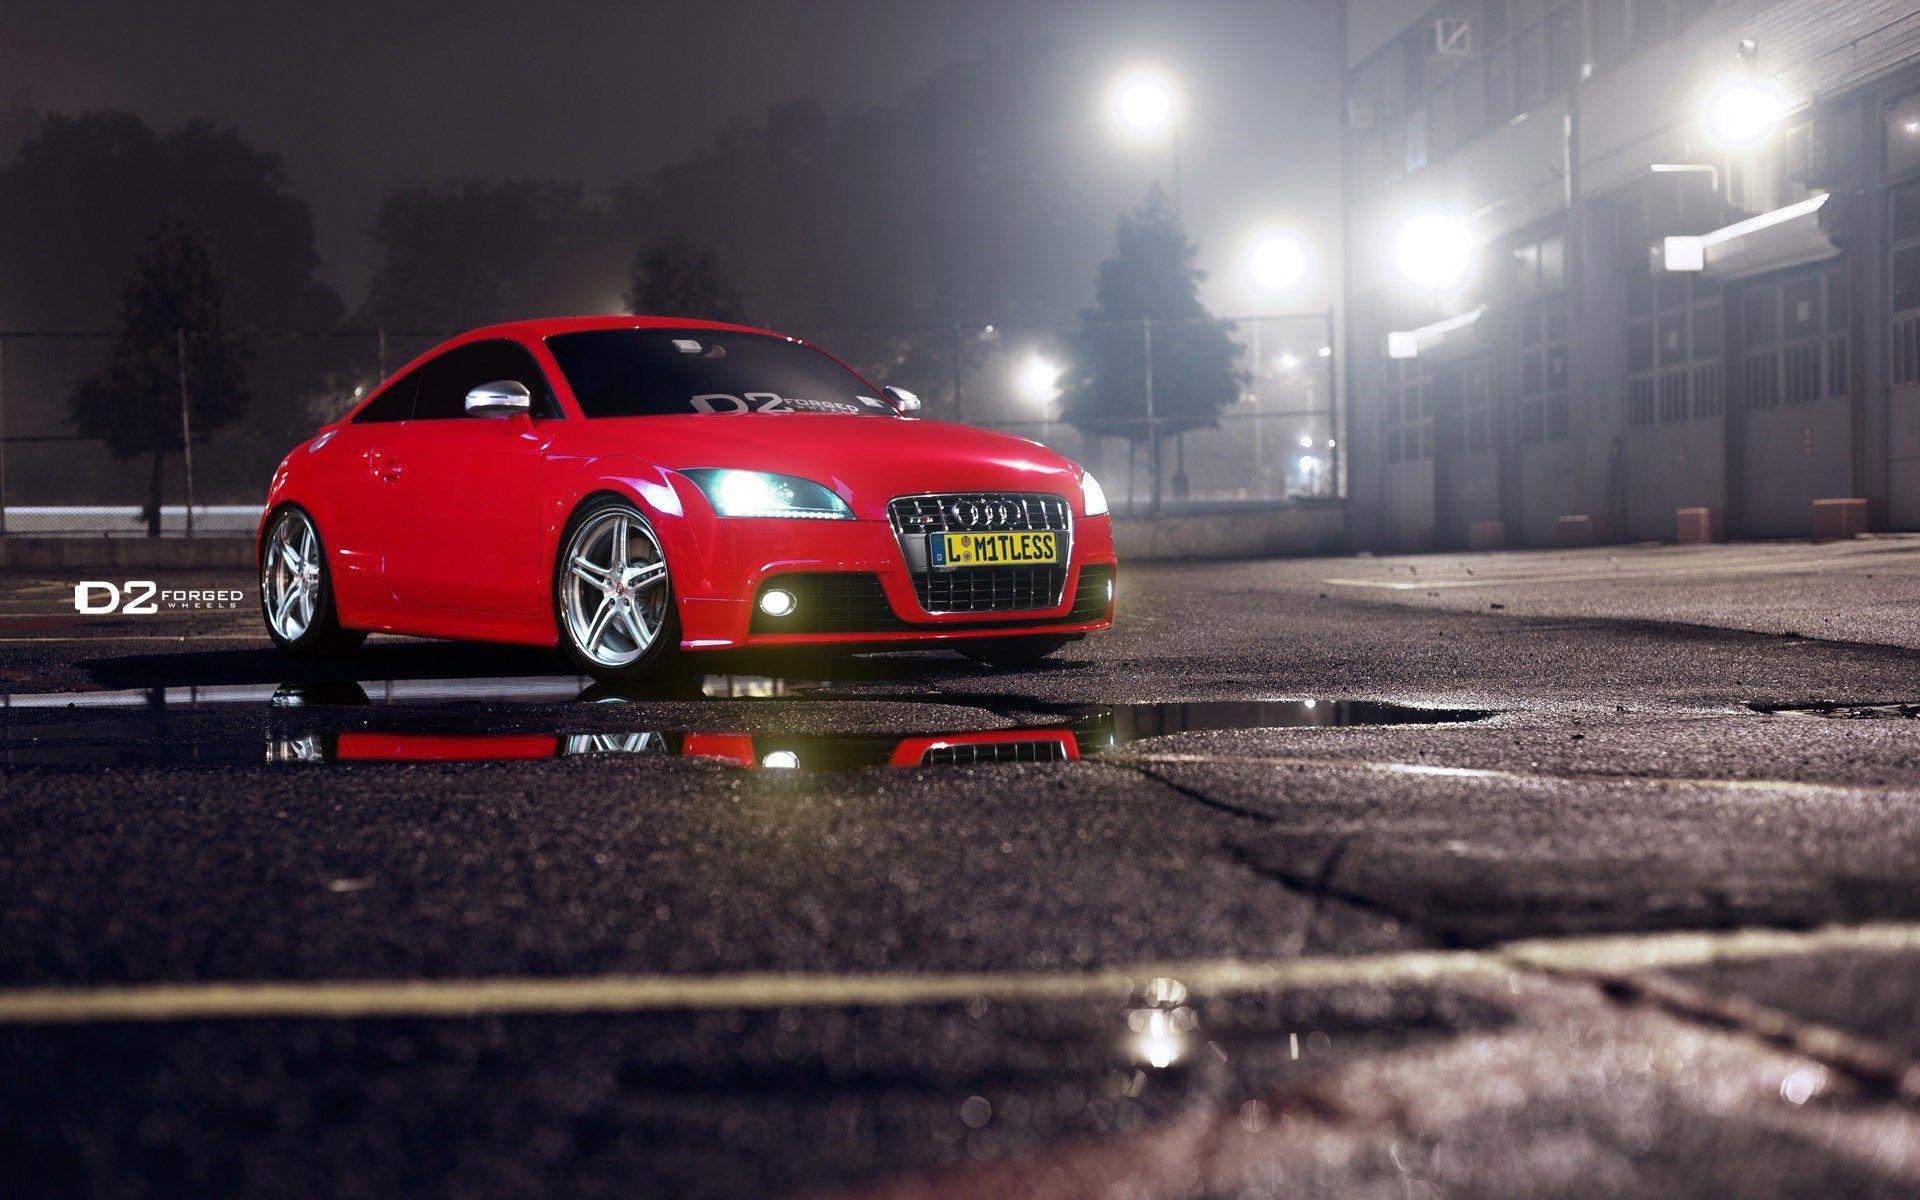 Energy Speed Audi Audi Red Night Audi Tt Red Audi Audi